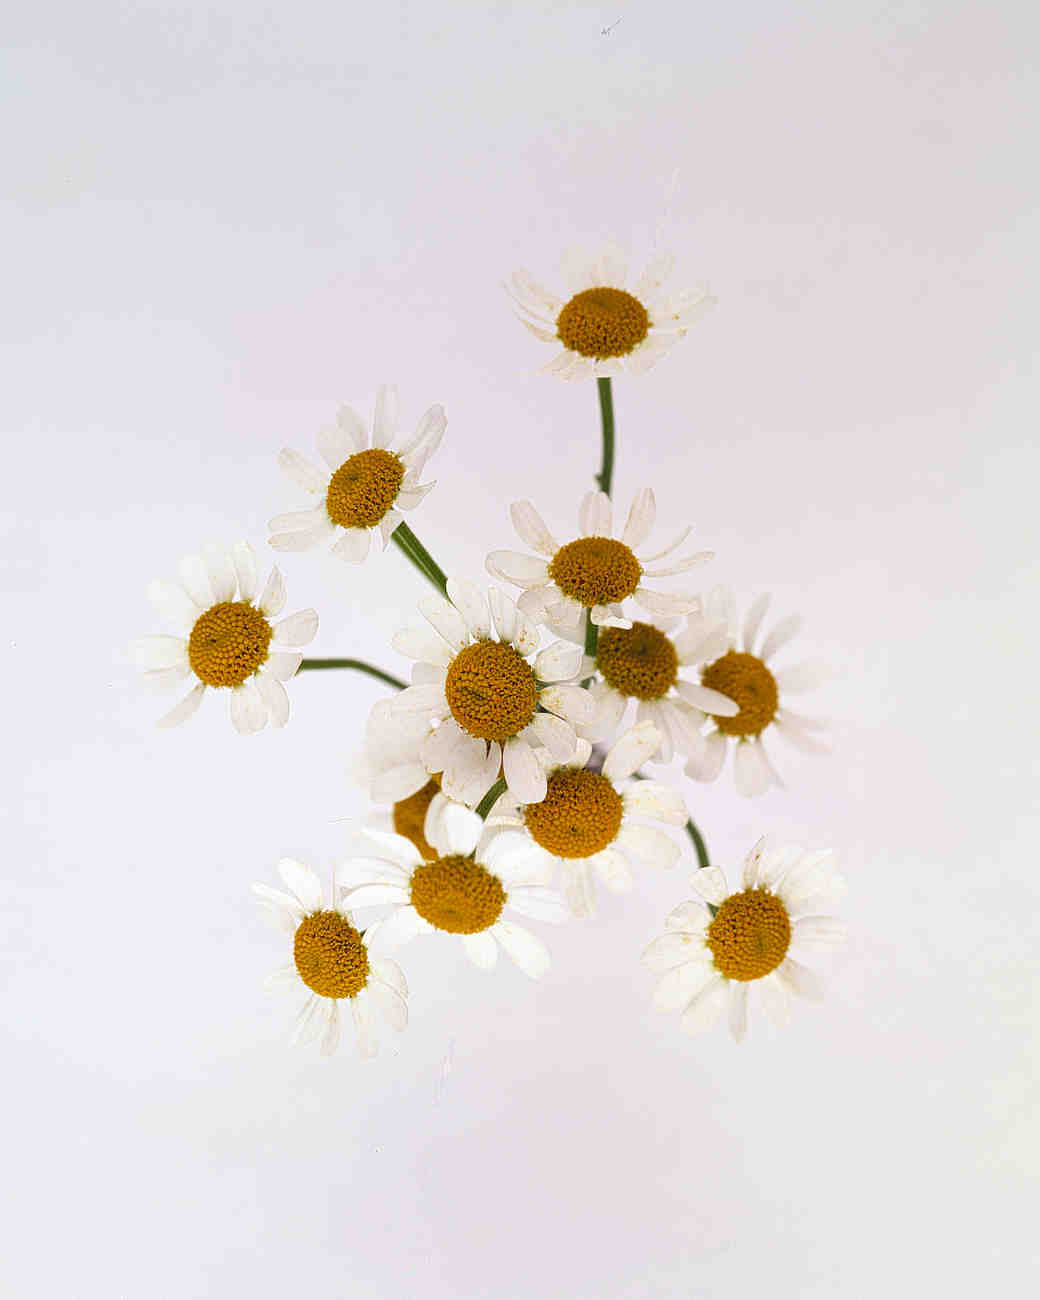 flower-glossary-chamomile-a98432-0415.jpg